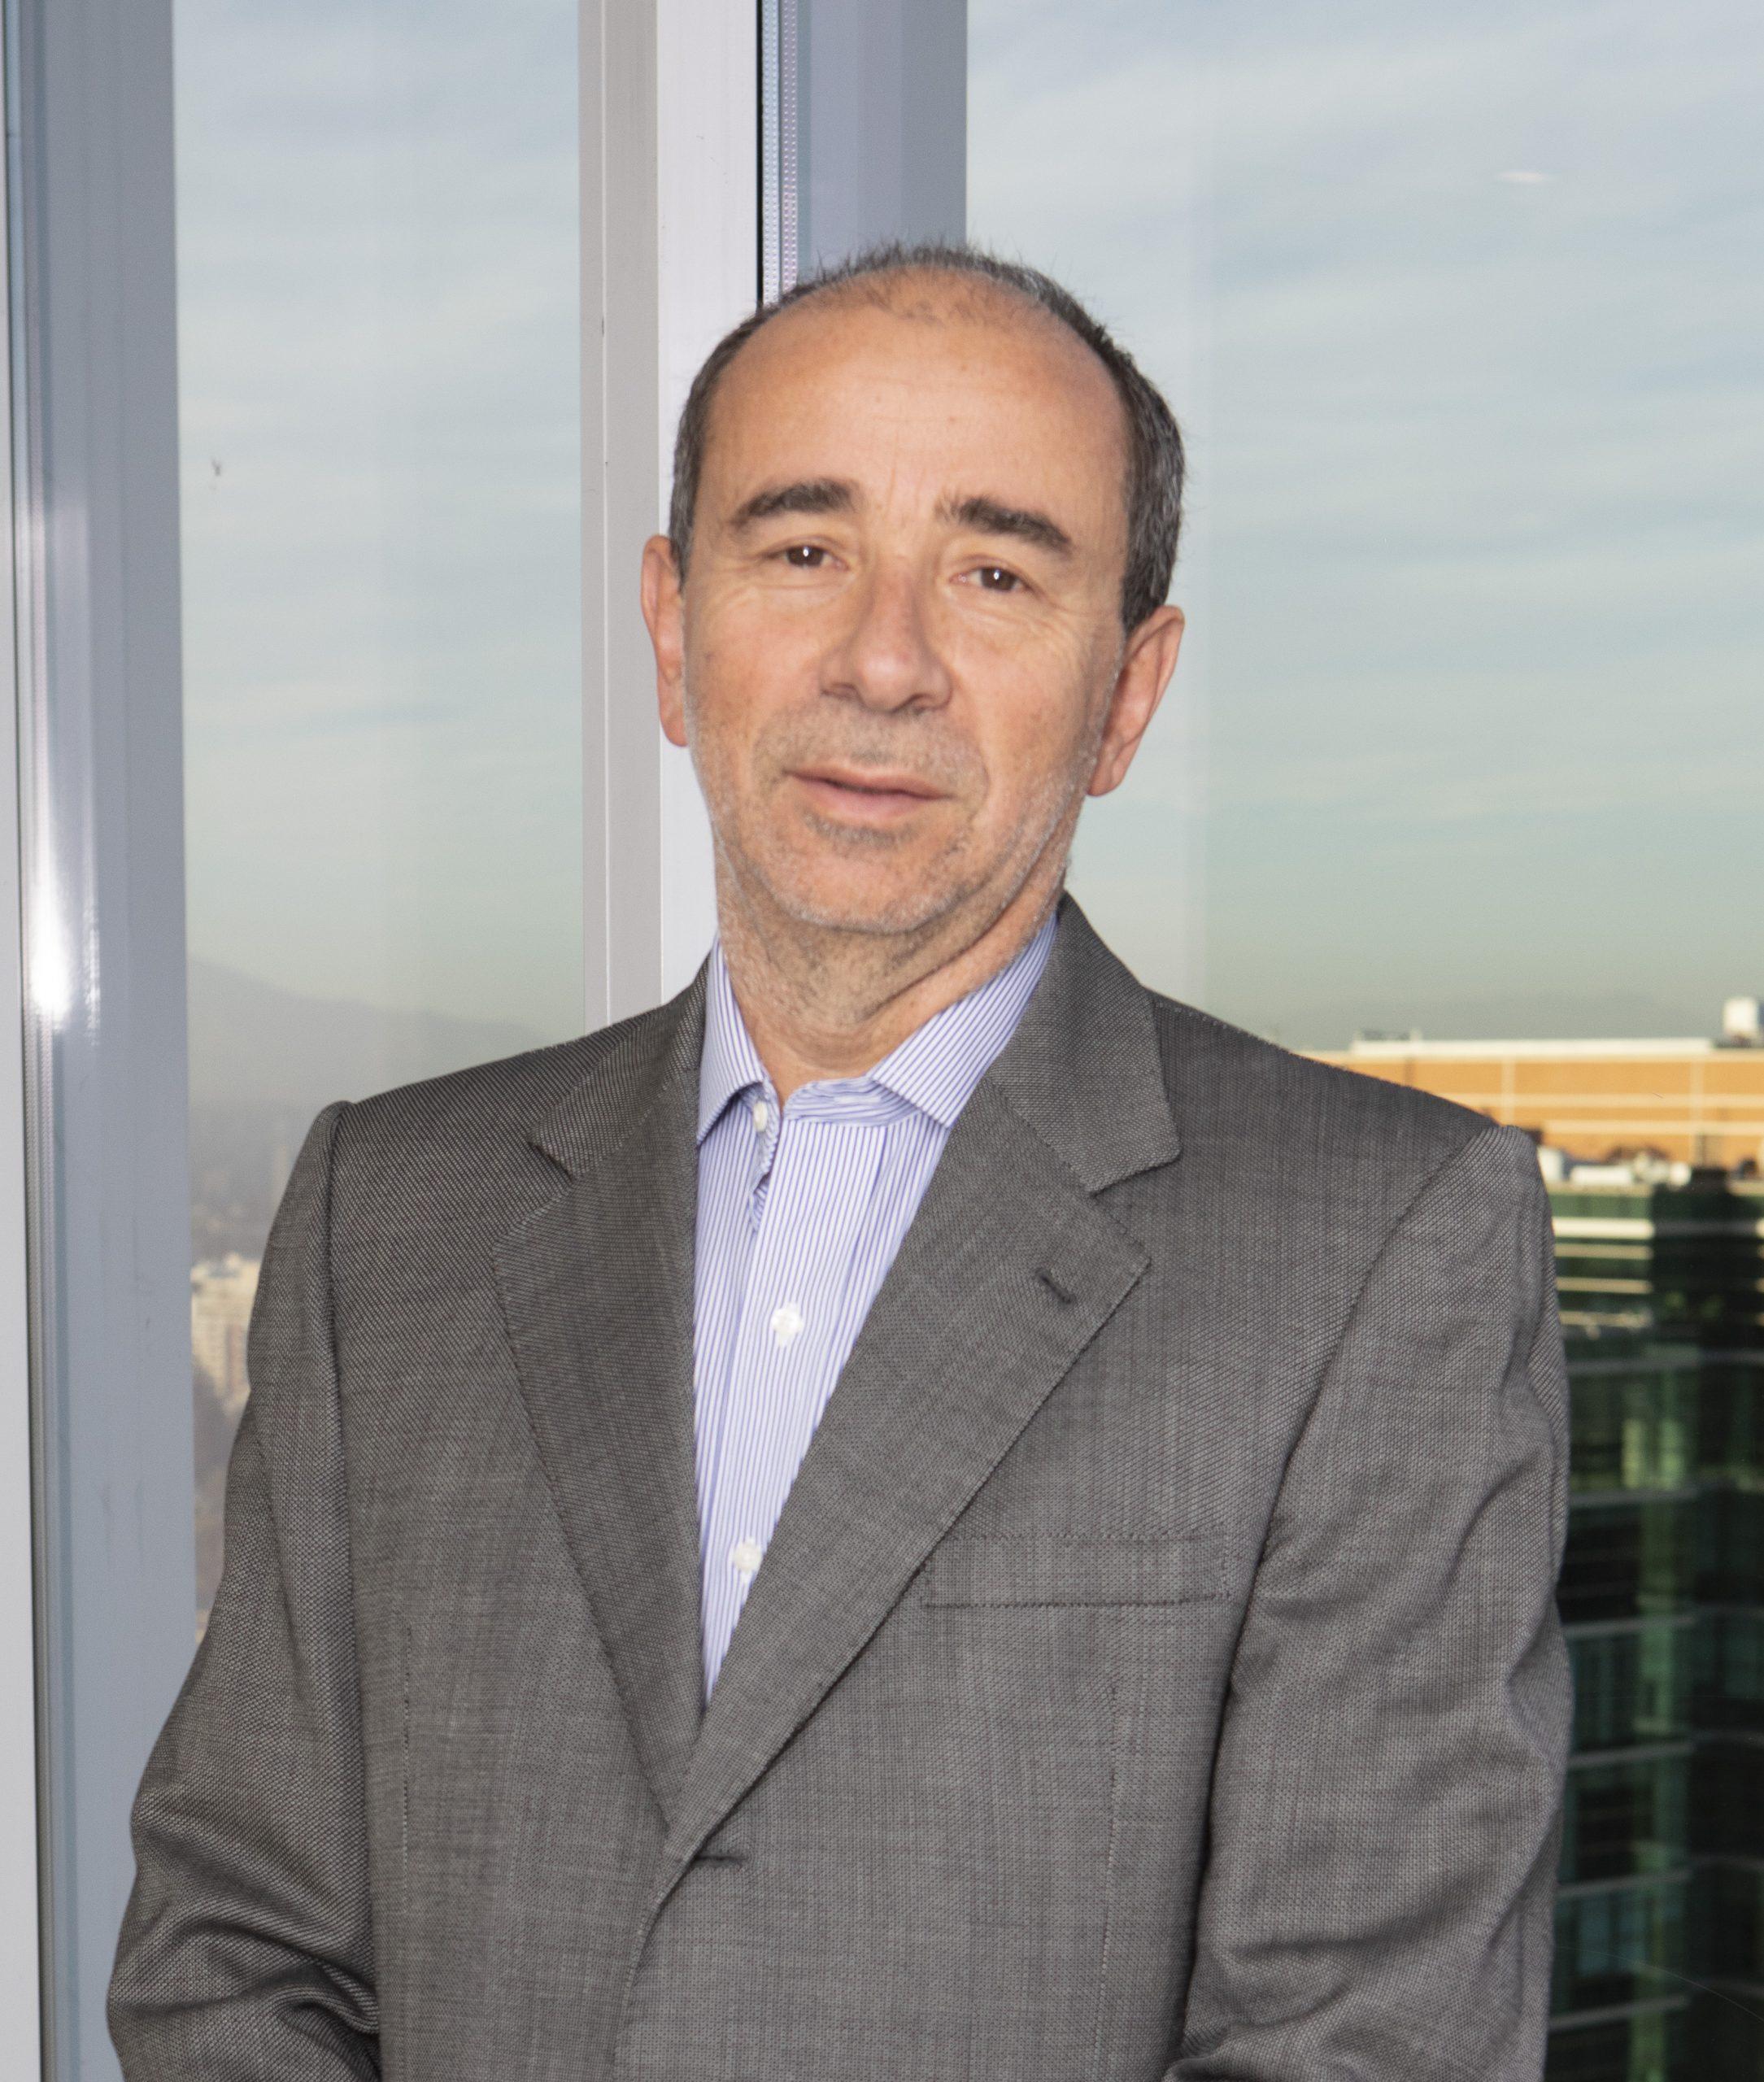 Francisco Javier Murillo Quiroga